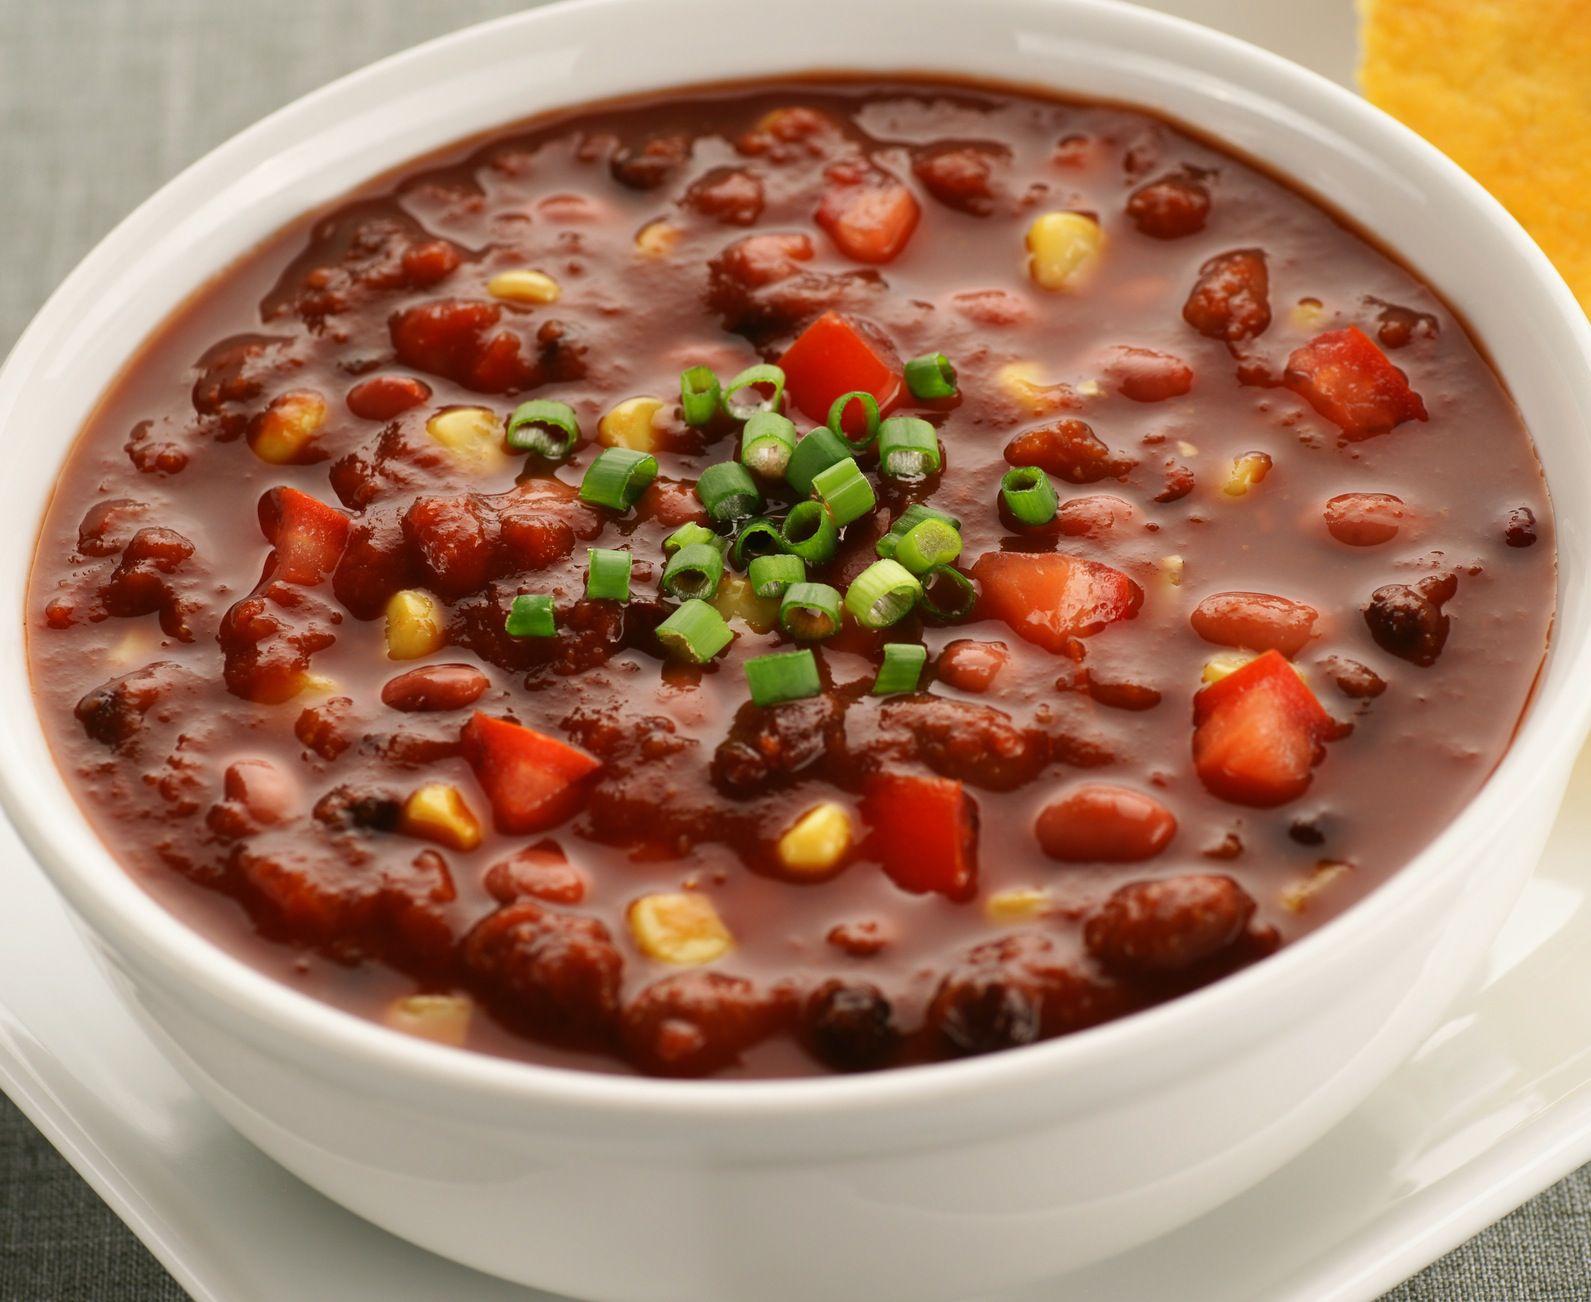 Super Easy Vegetarian Chili Recipe (Vegan, Gluten-free